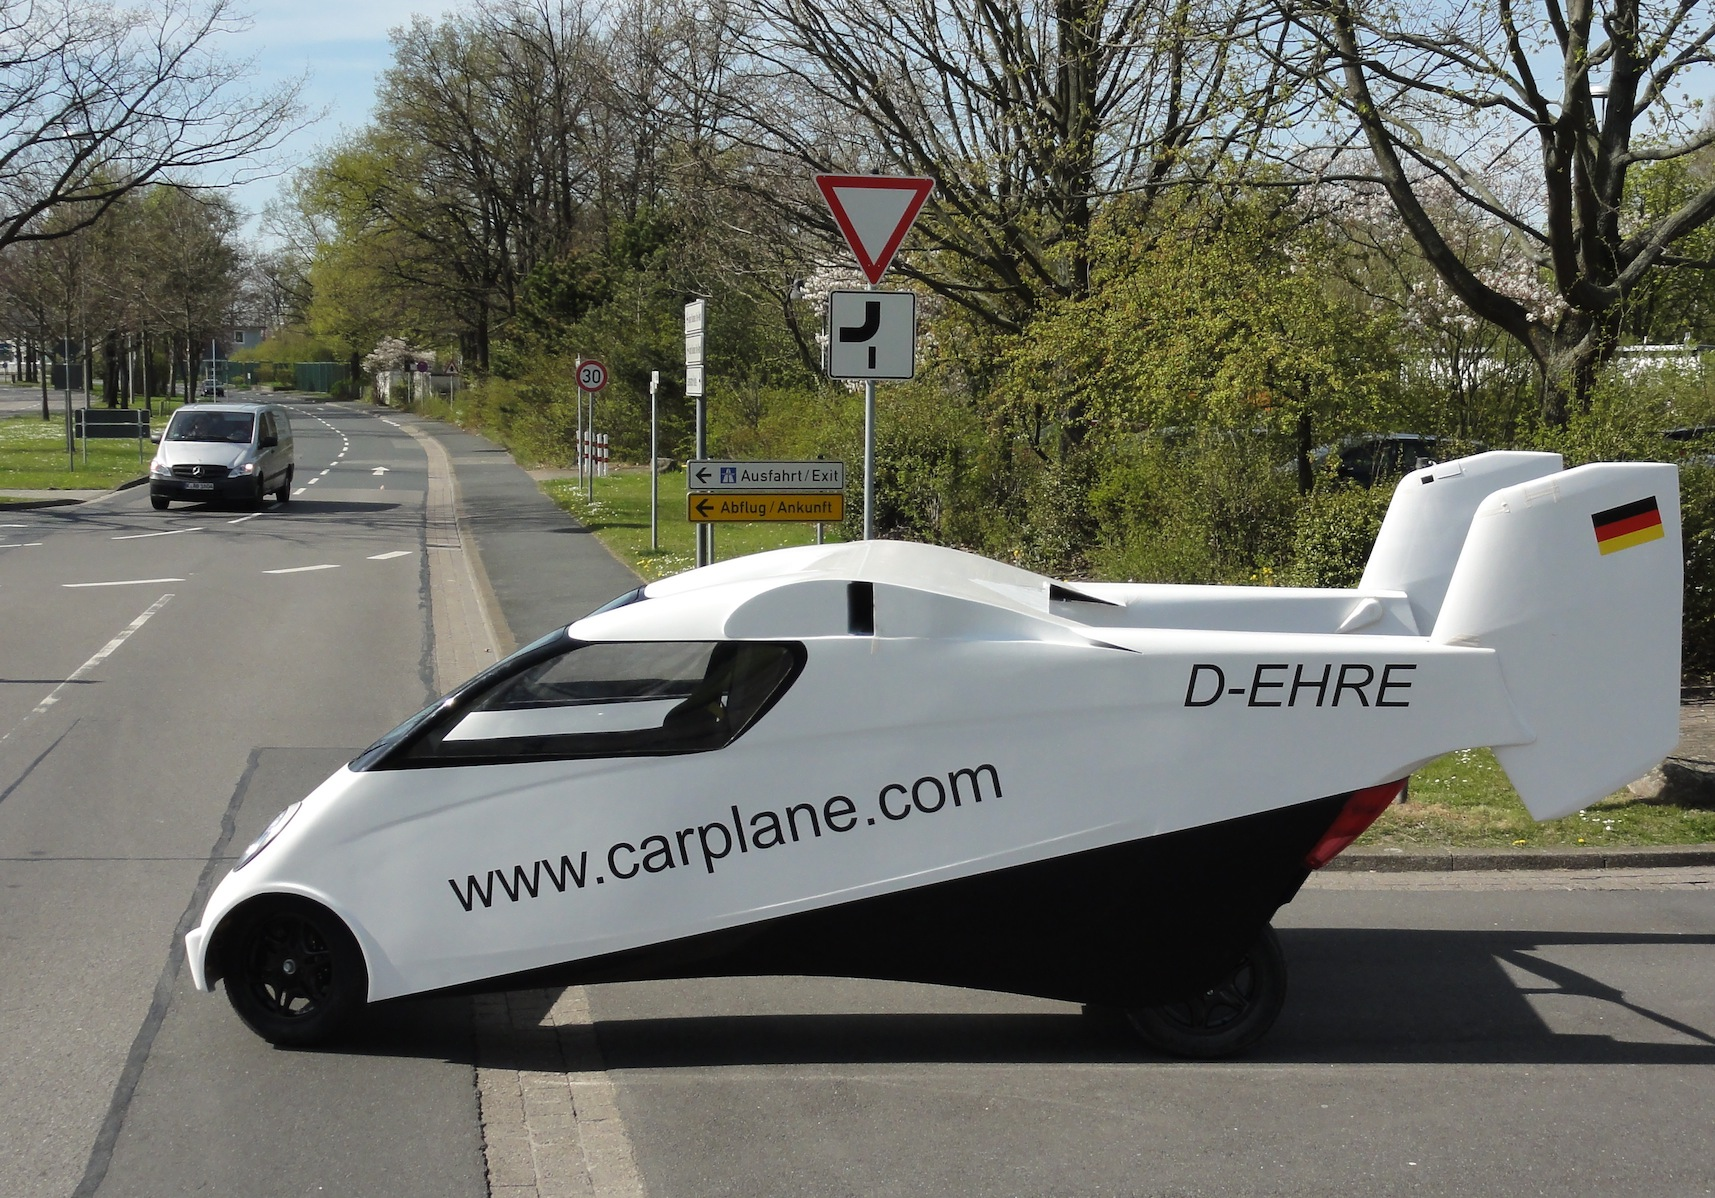 Carplane pulling onto the autobahn in Germany. (Carplane)